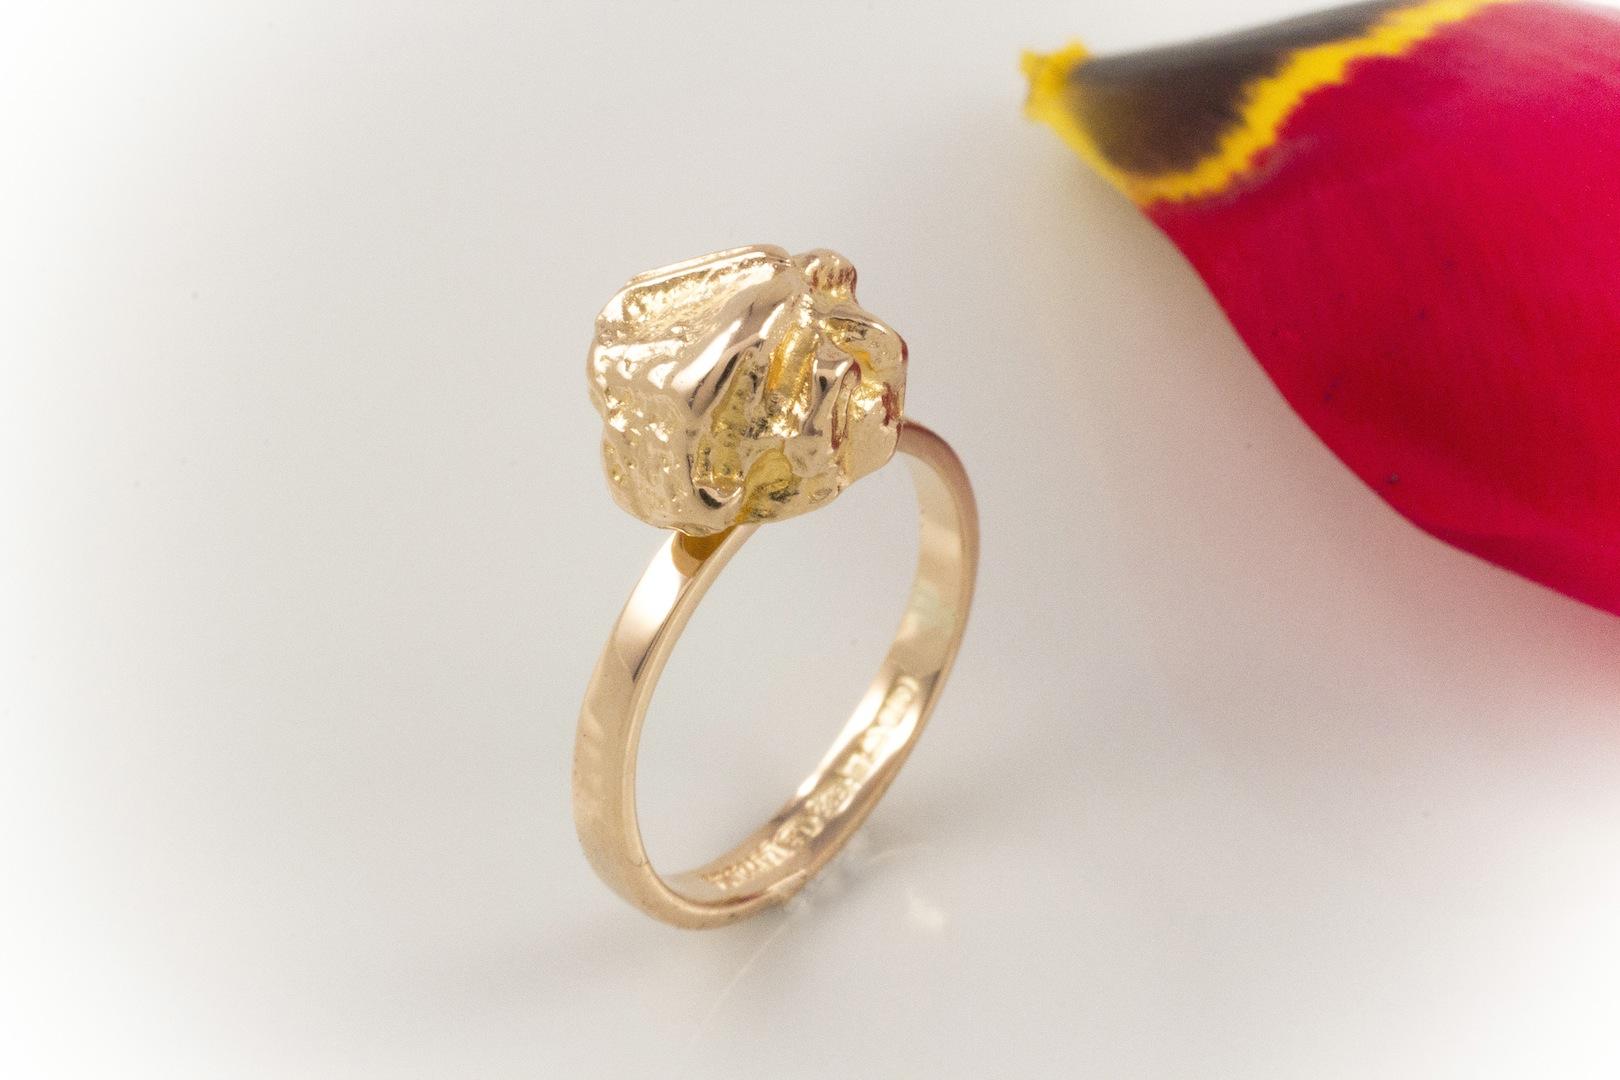 schmuckgebiet shop besonders sch ner lapponia ring in 585 gold 14 karat gelbgold echten. Black Bedroom Furniture Sets. Home Design Ideas